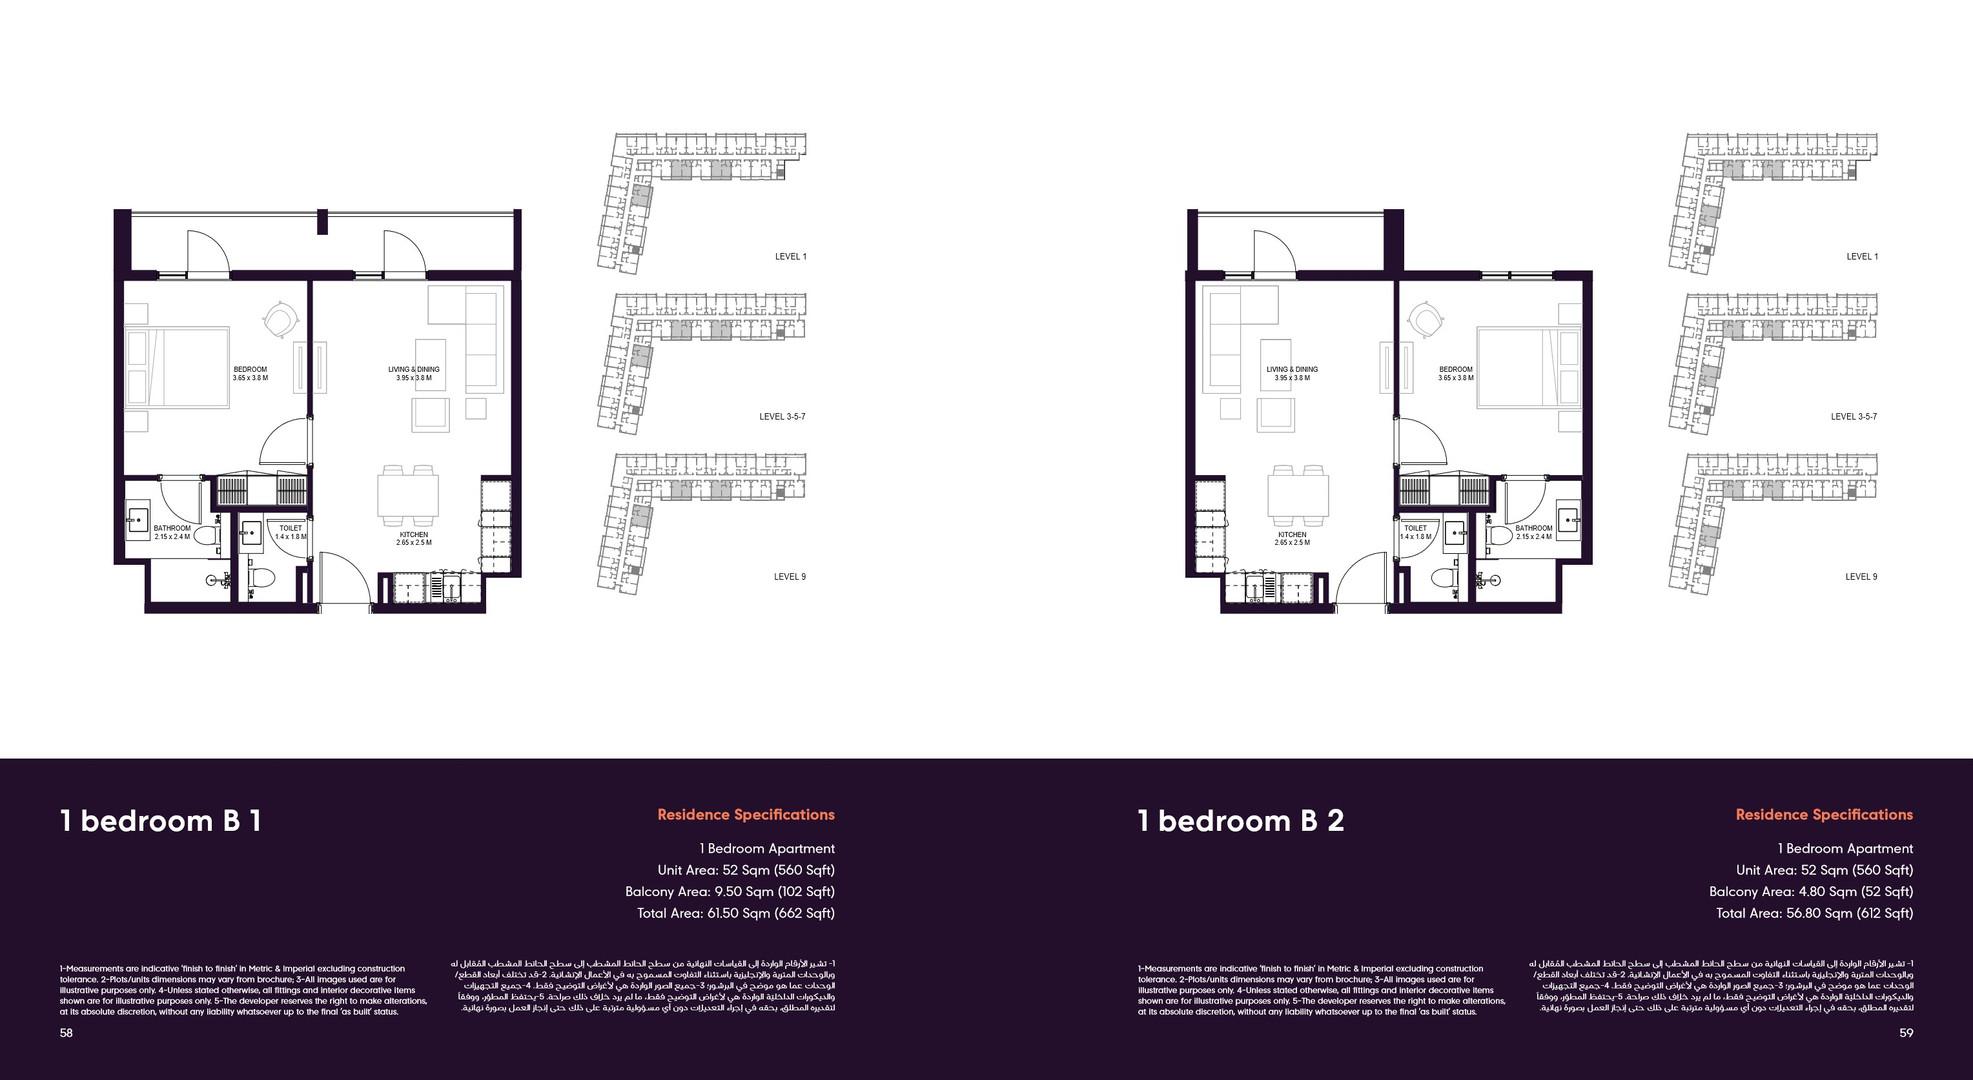 The-Boulevard-2-Brochure_31.jpg